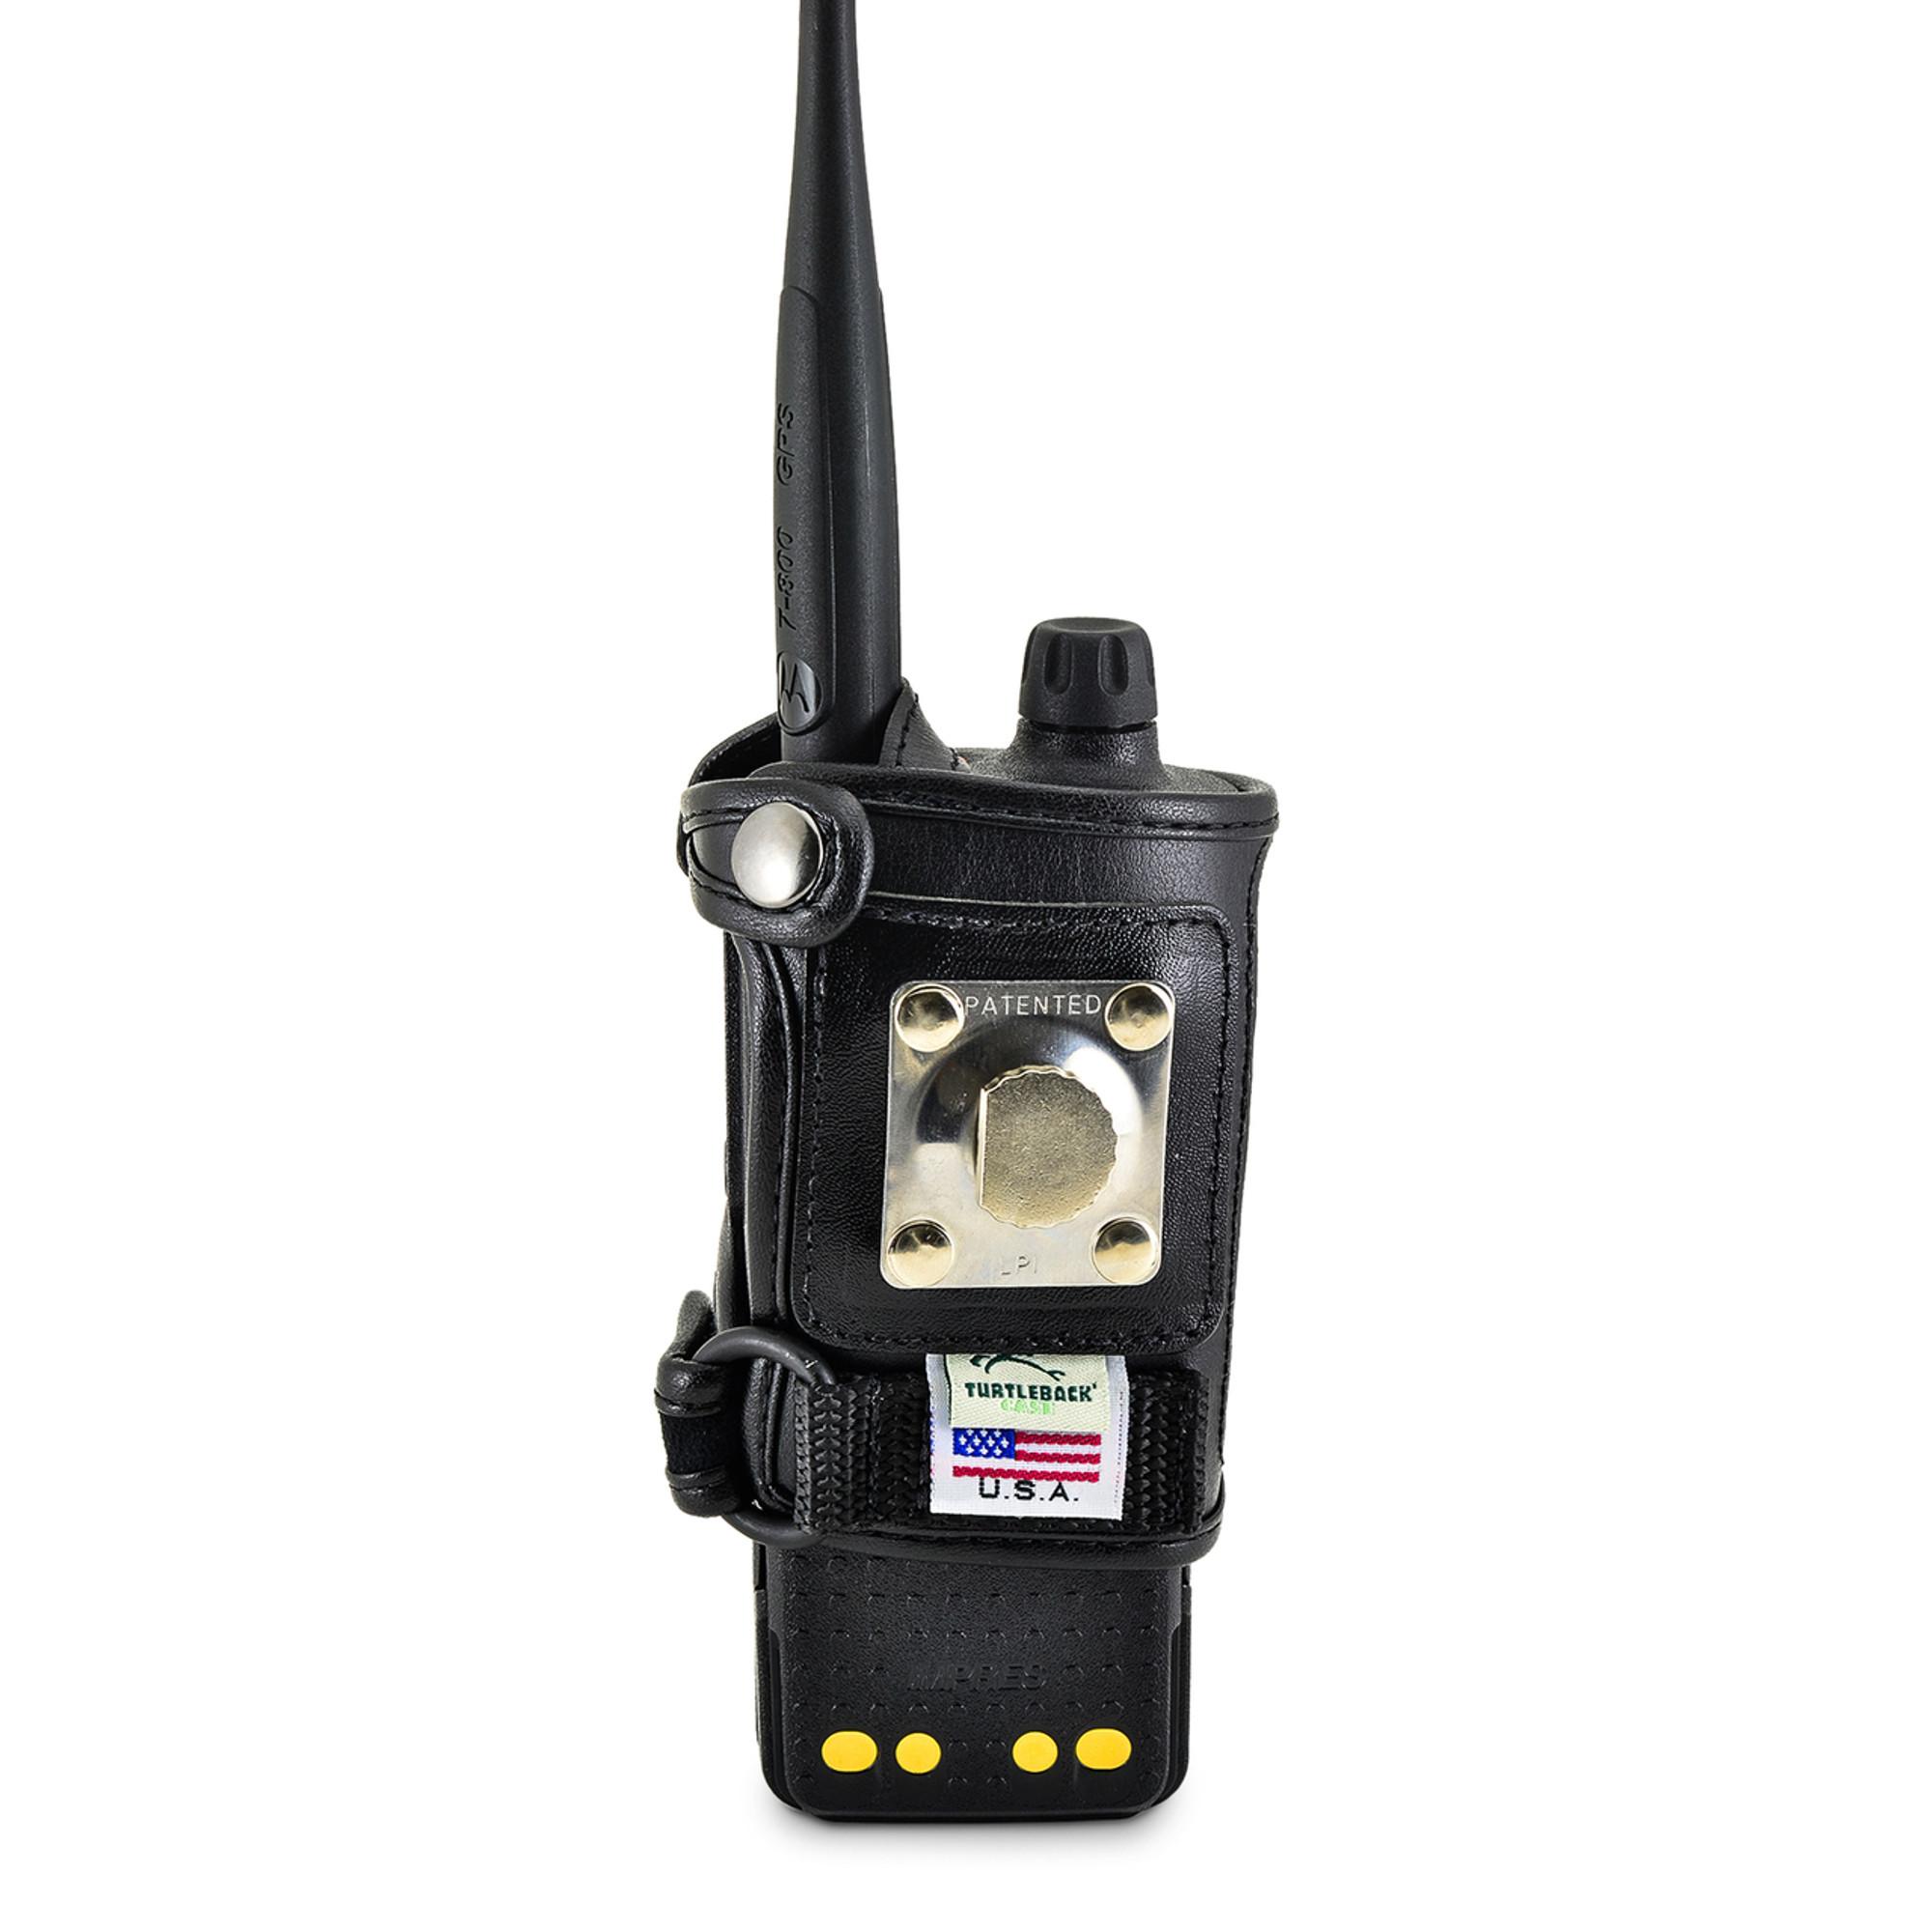 motorola 4000 radio. motorola apx 4000 single knob radio duty belt carry holder case black leather holster with heavy